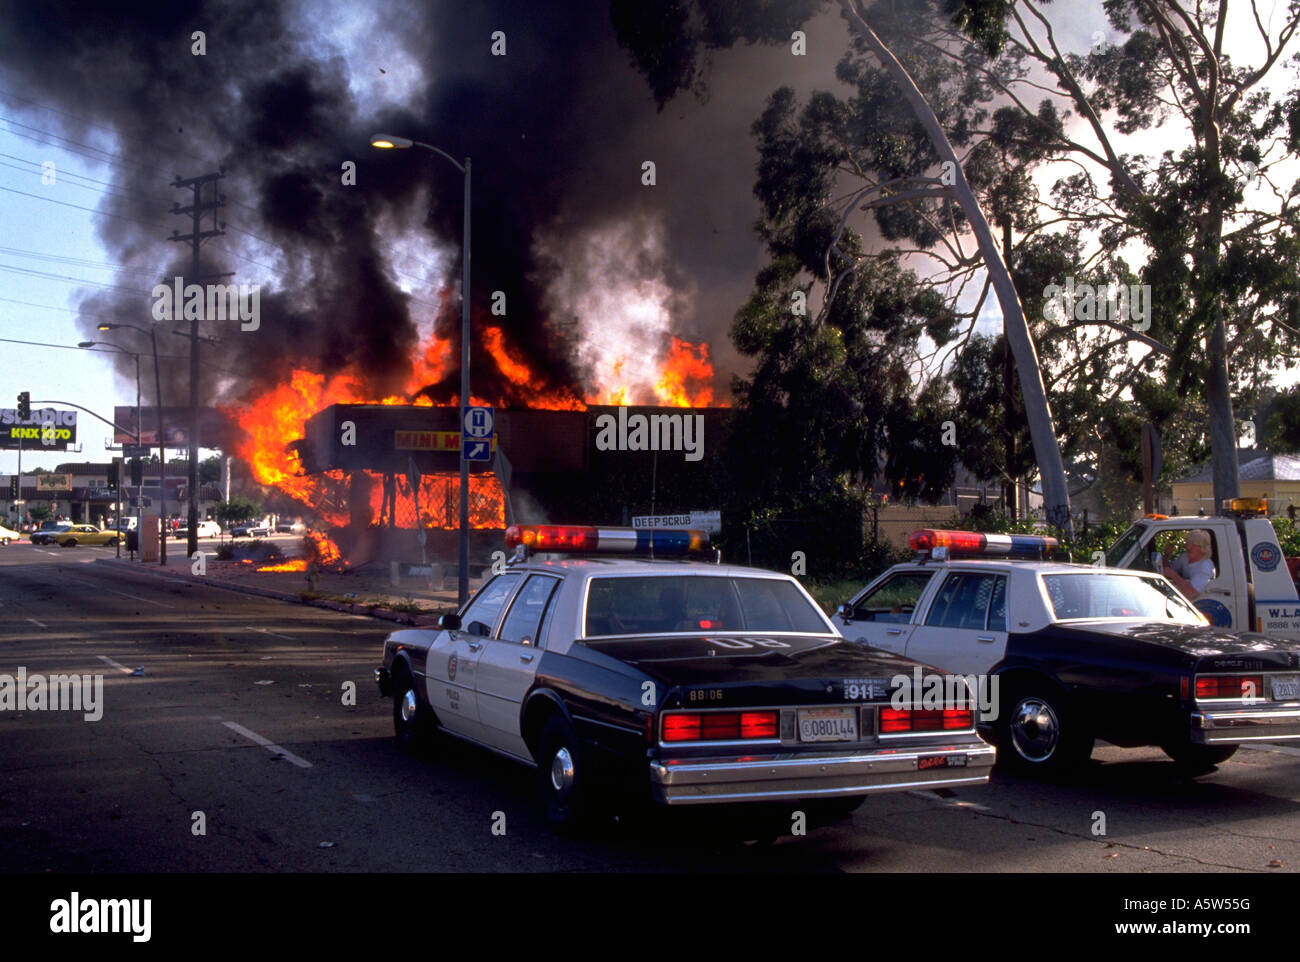 Painet hl0986 scene los angeles riots 1992 california